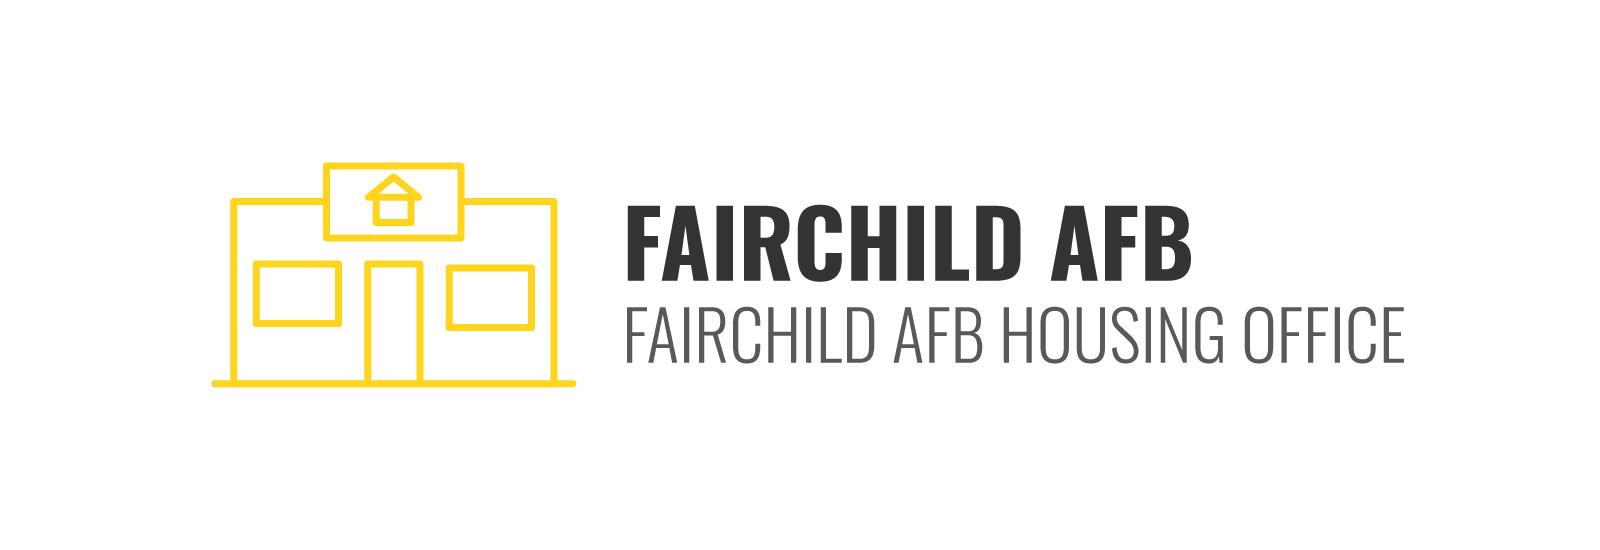 Fairchild AFB Housing Office